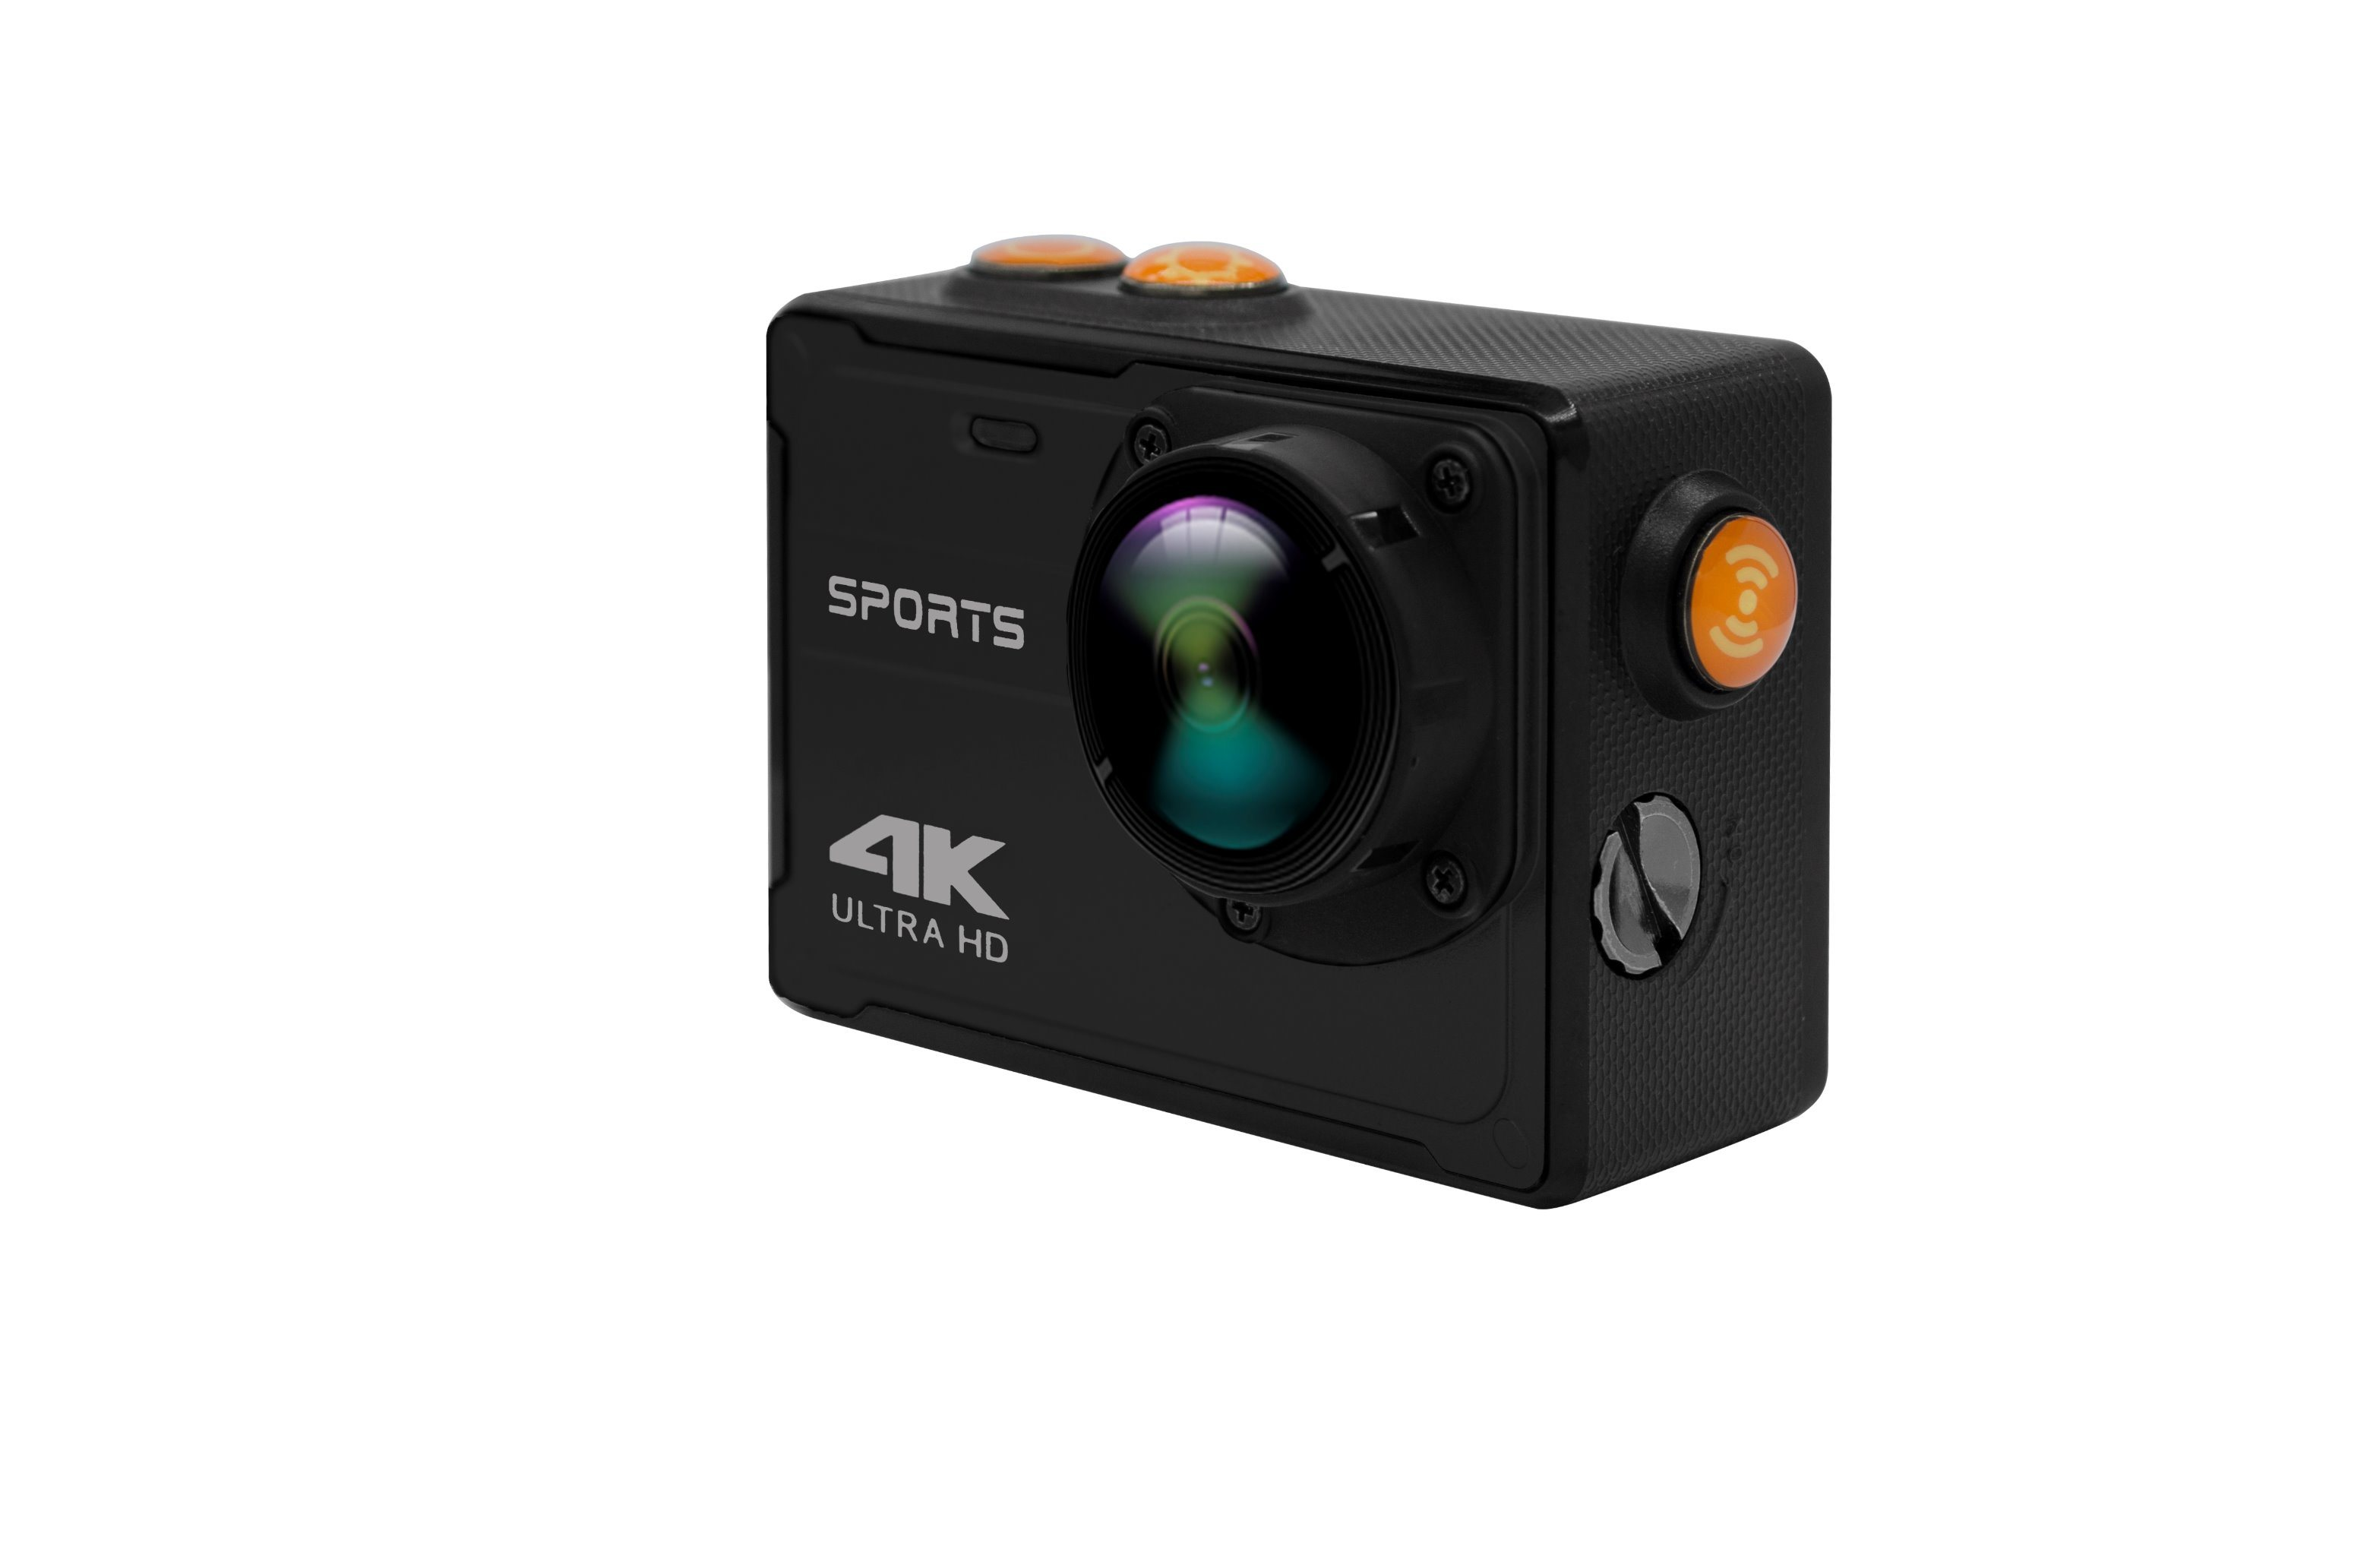 16MP 4k 5m Waterproof WiFi Action Sports Camera